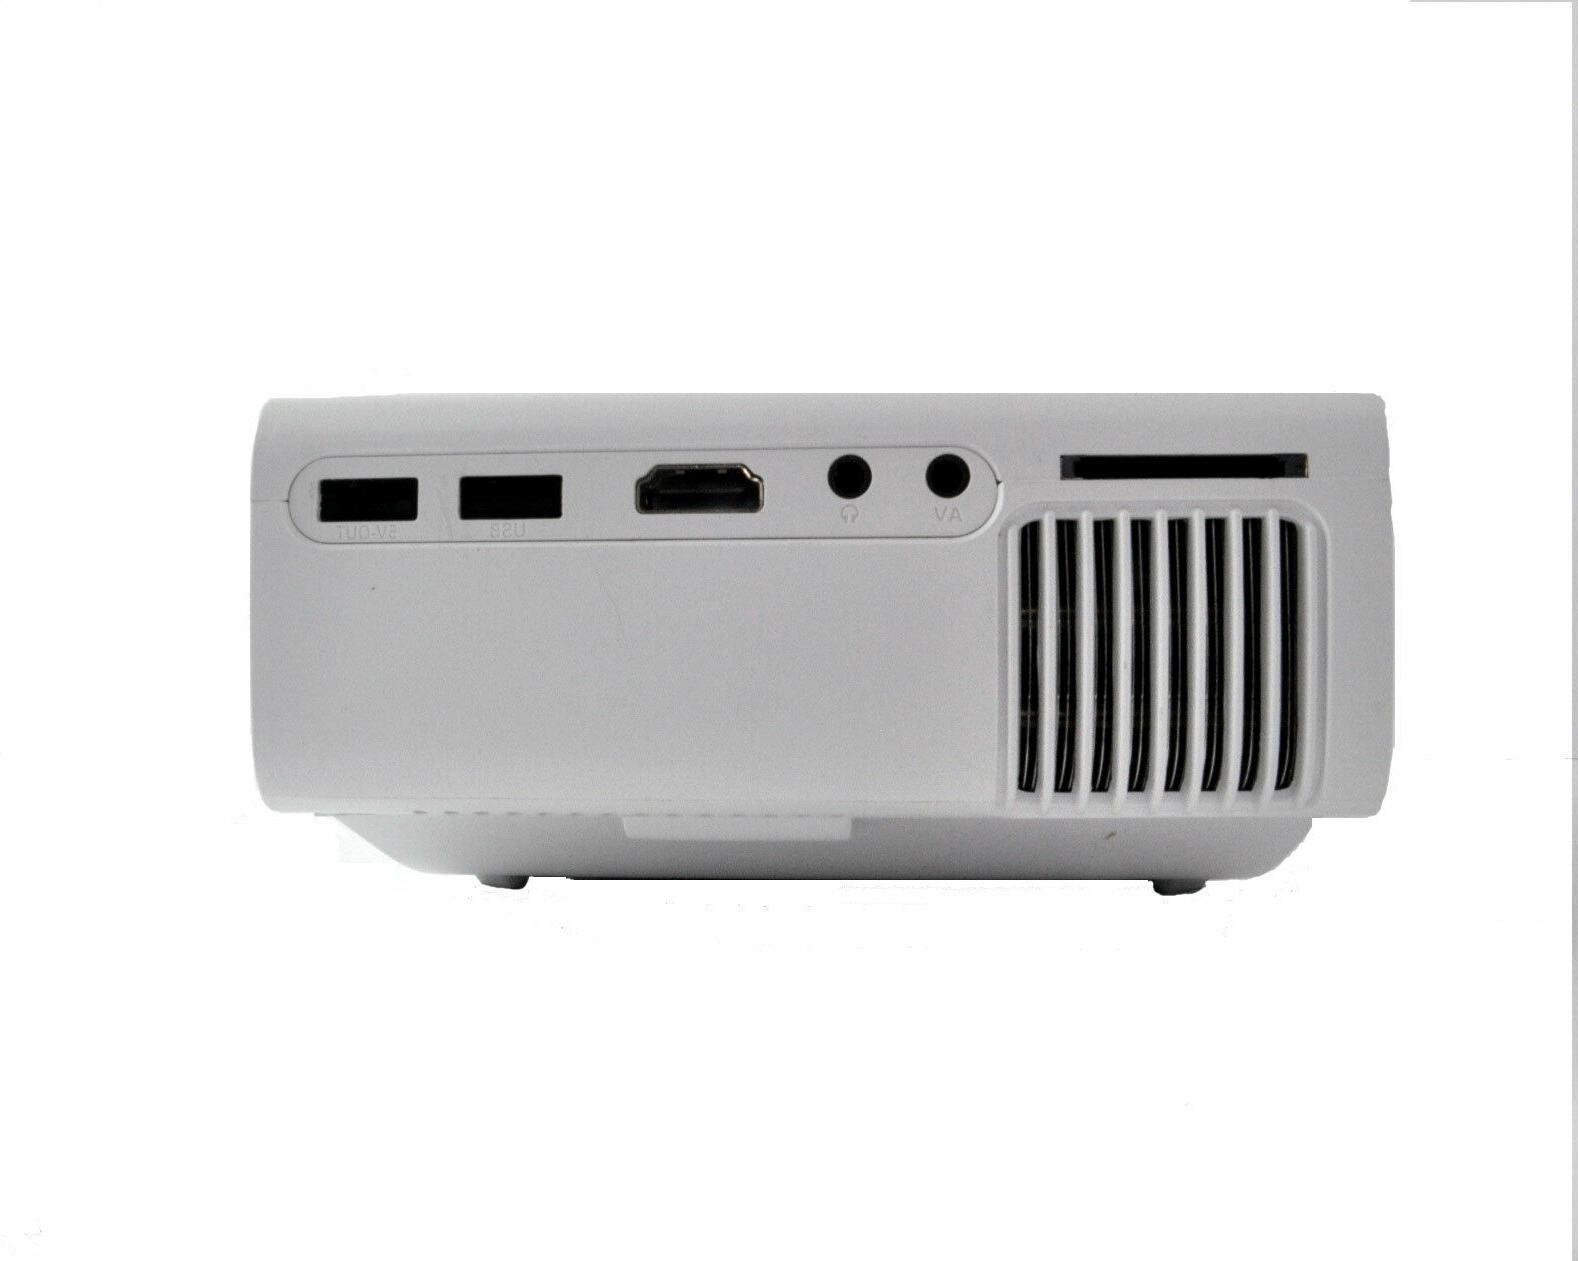 New Mini Projector Portable 1080P Indoor/Outdoor